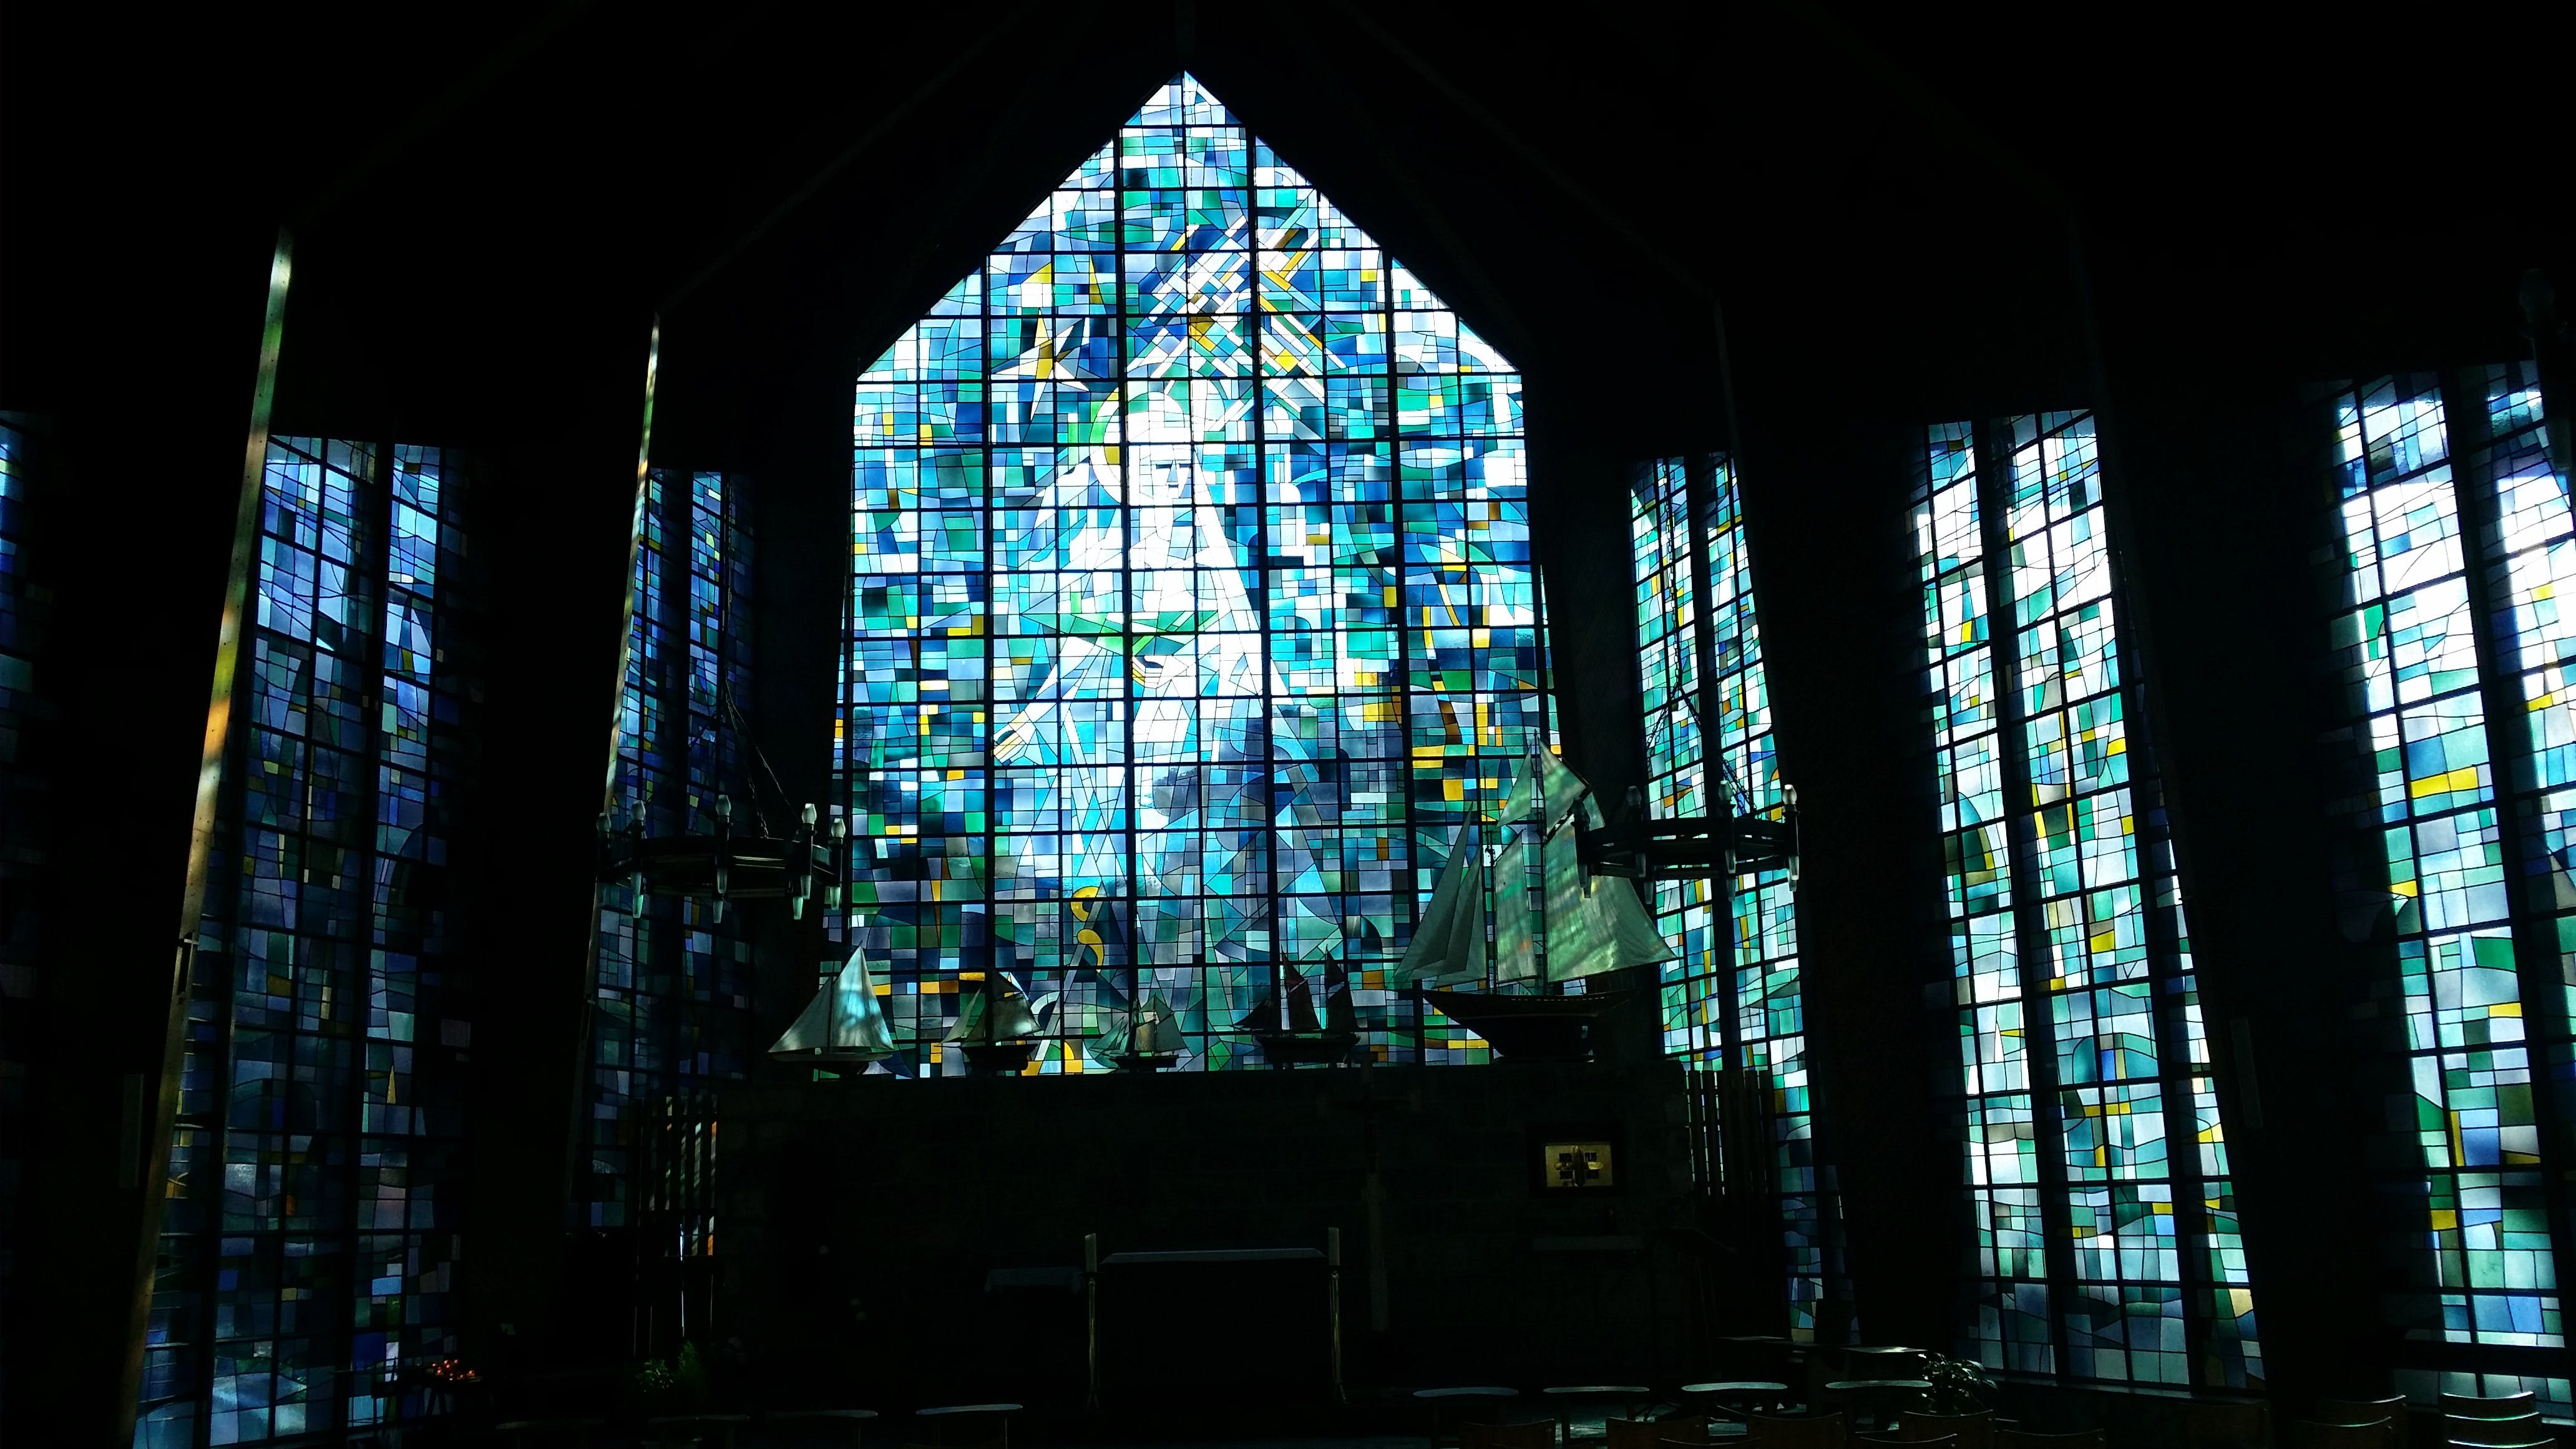 architecture, building, church